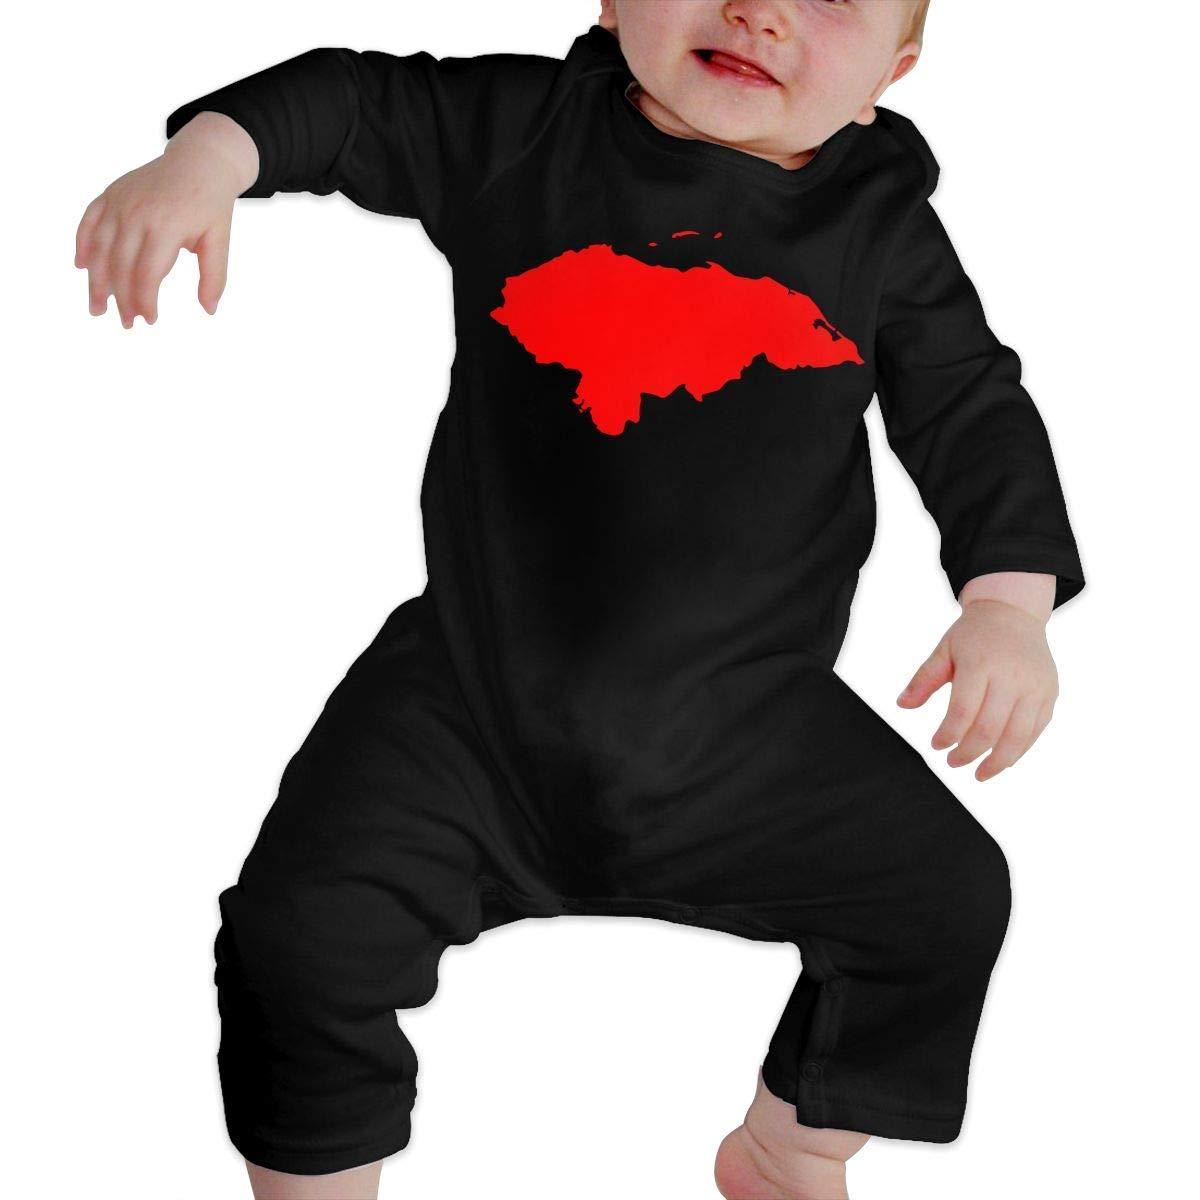 TYLER DEAN Newborn Kids Bodysuits Honduras Map Baby Clothes